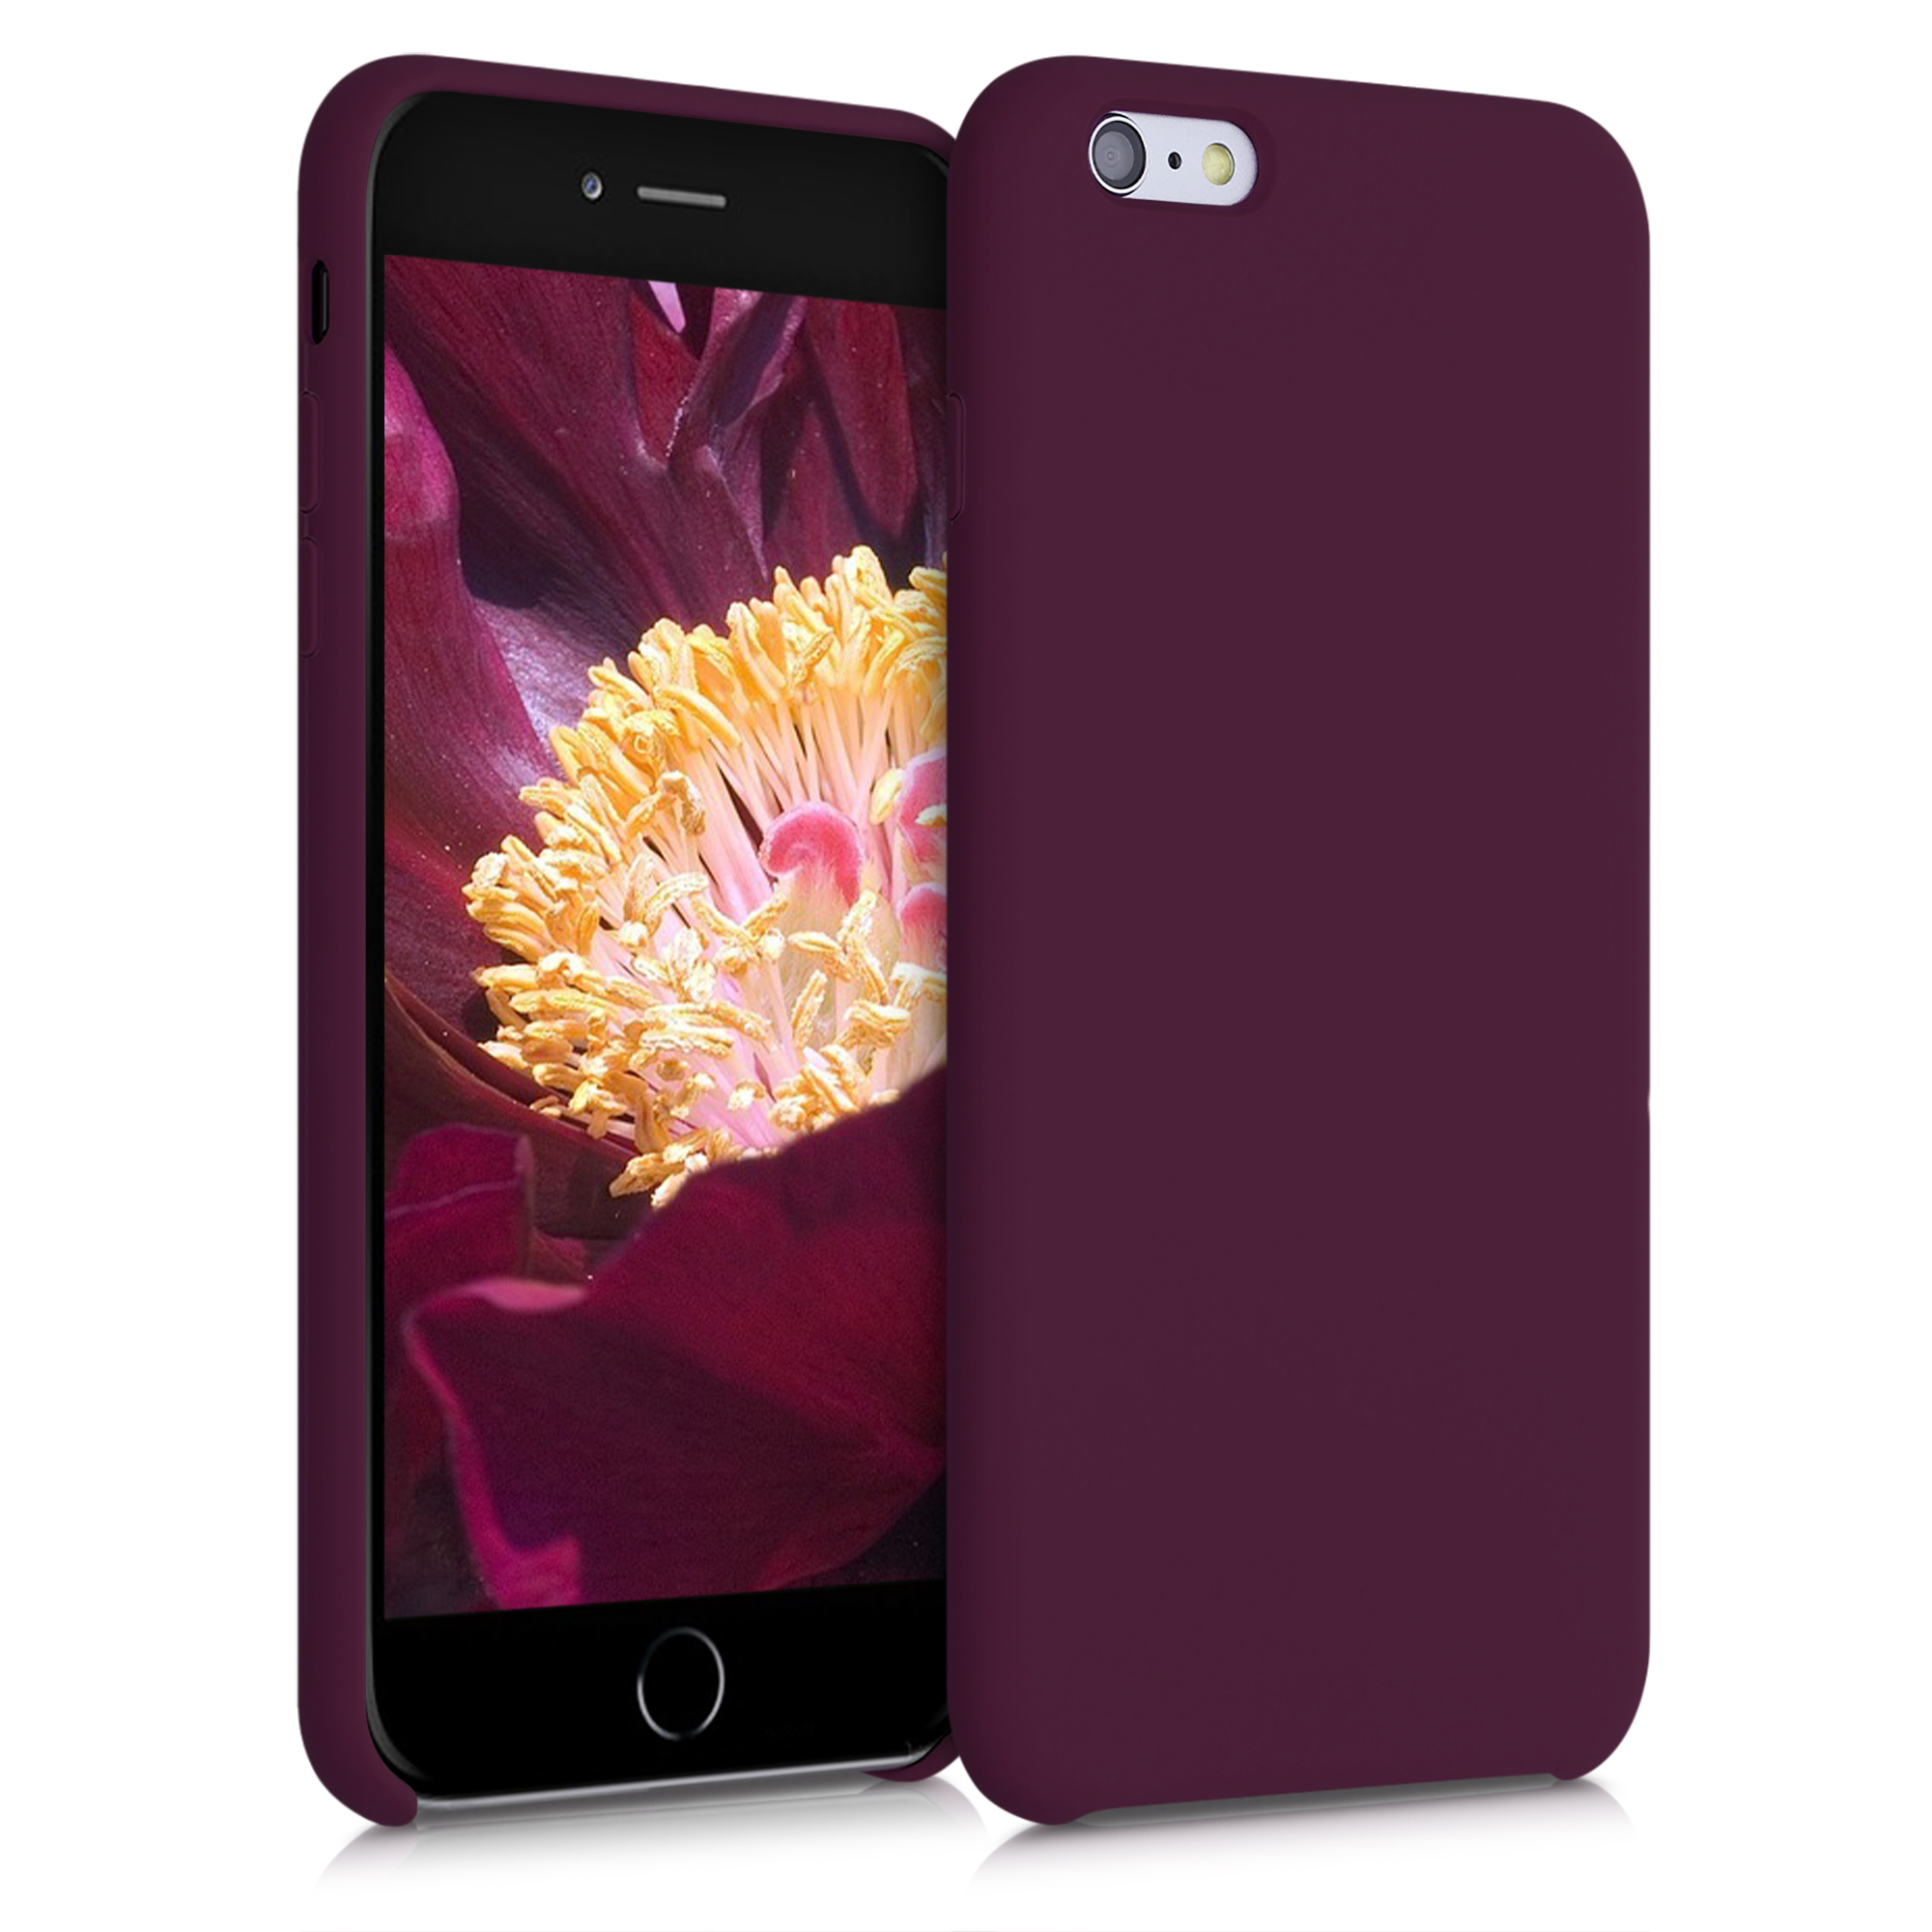 Kvalitní silikonové TPU pouzdro pro Apple iPhone 6 Plus / 6S - Bordeaux Violet